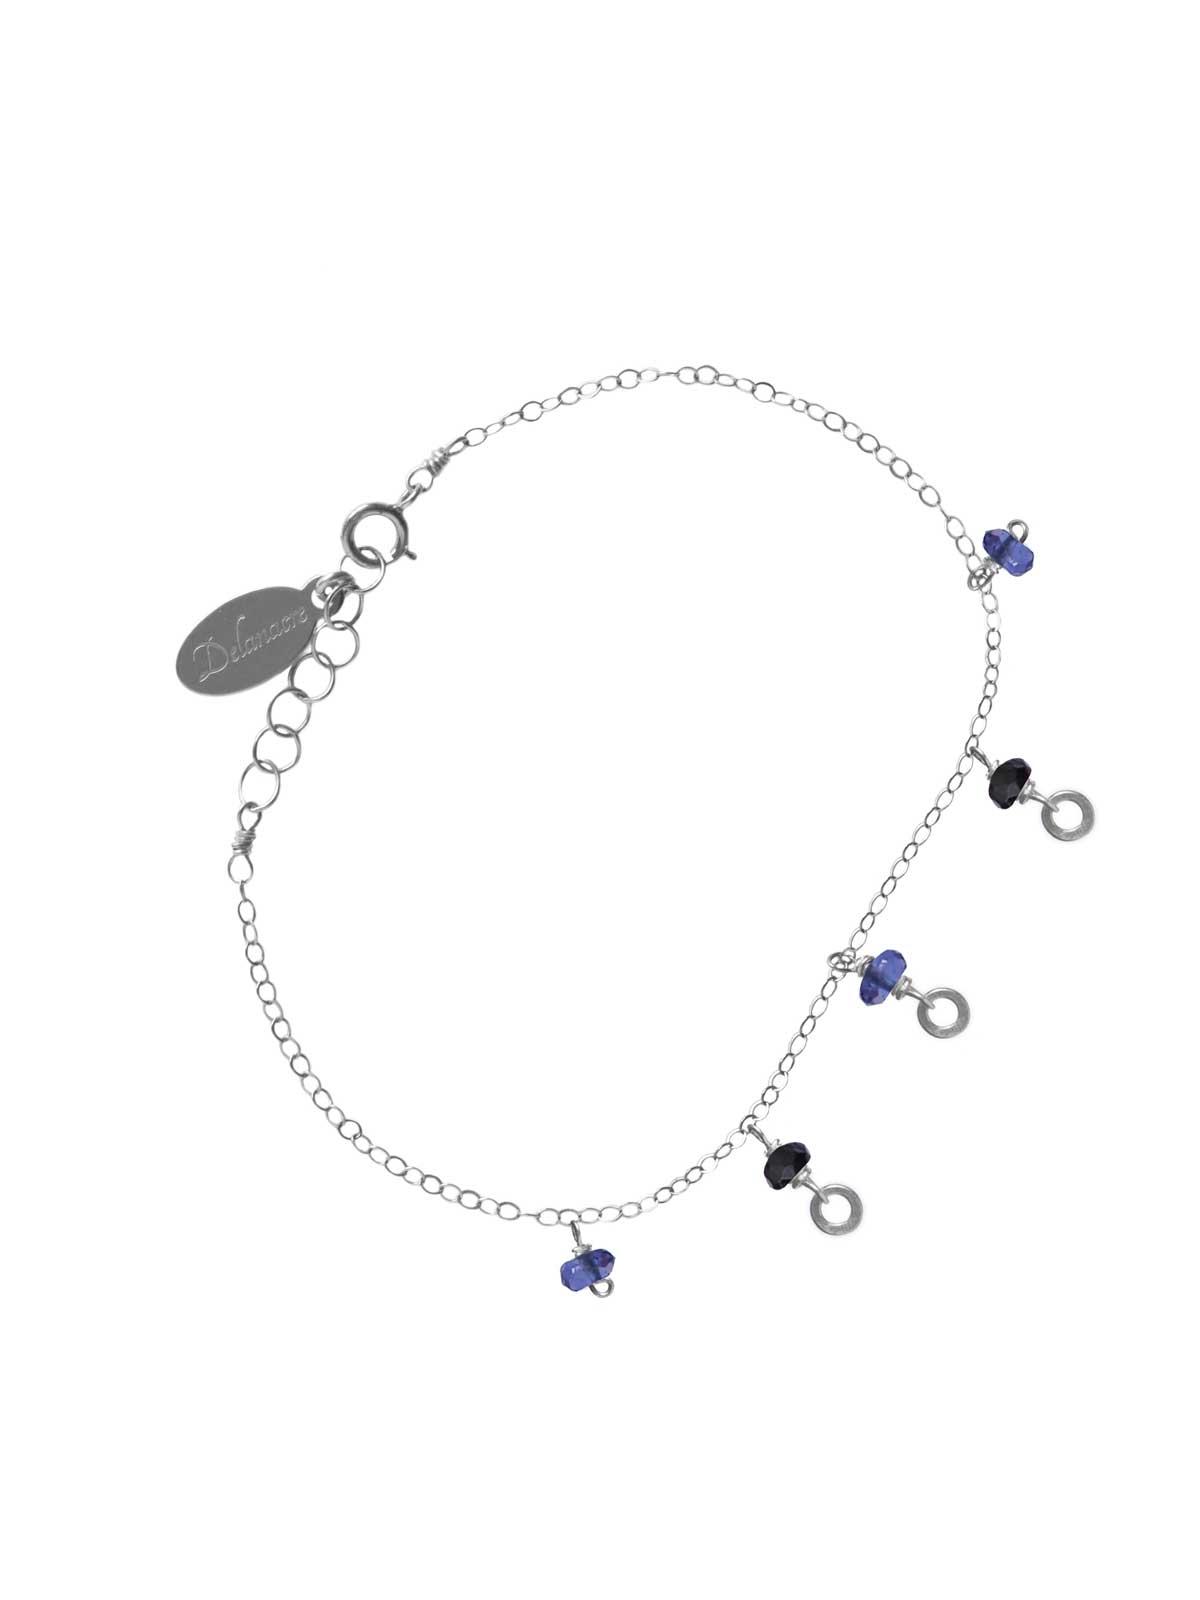 Bracelet in Sterling Silver chain Iolite Black Spinel